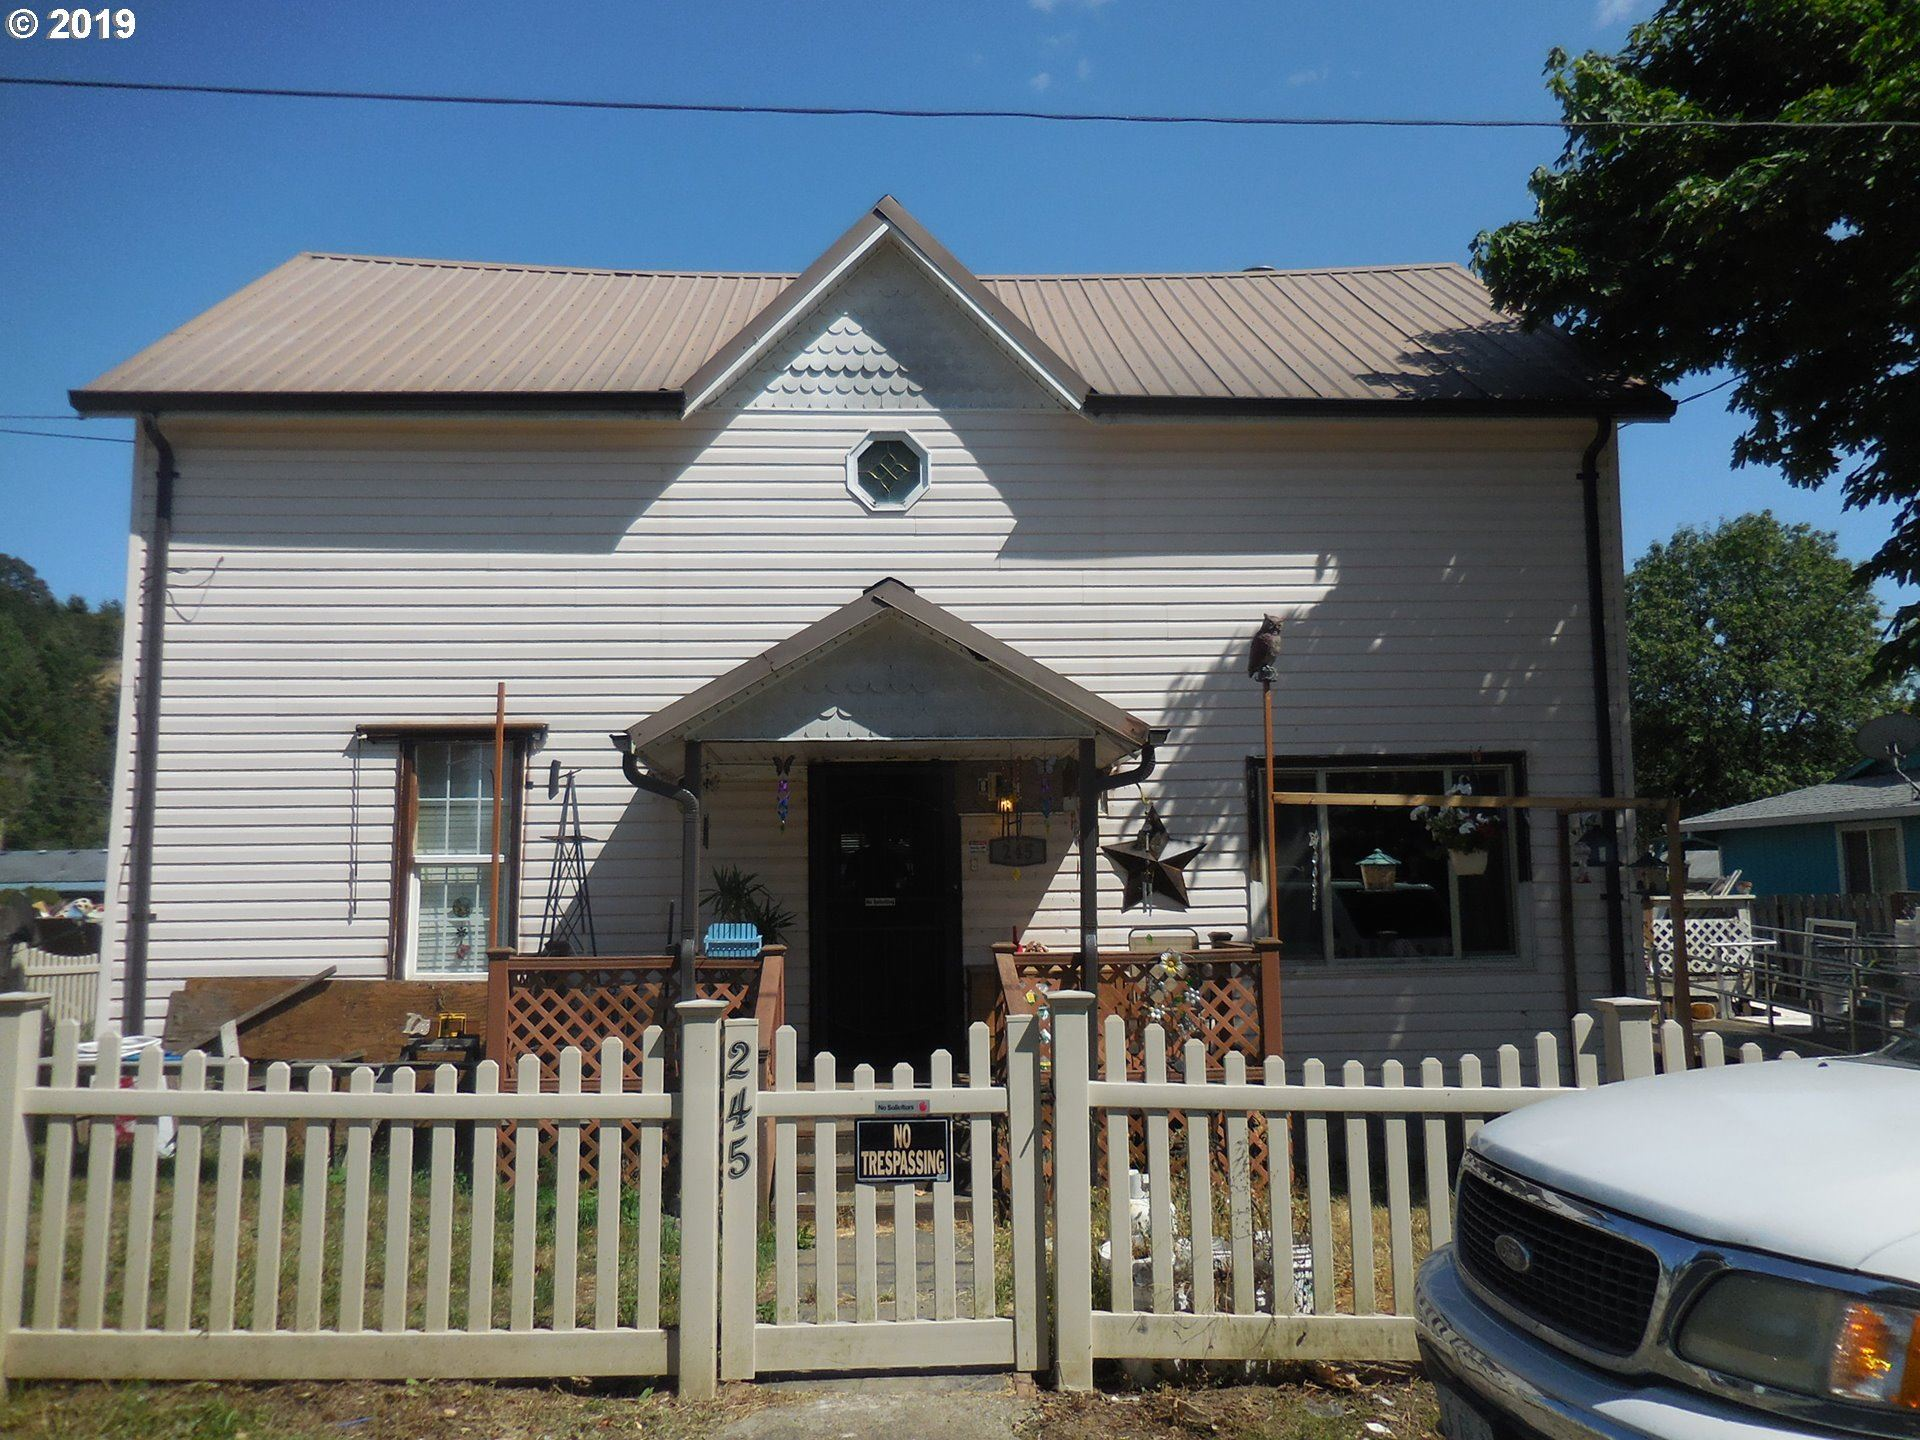 245 NE BALM ST, Sheridan, OR 97378 - MLS#: 18671129